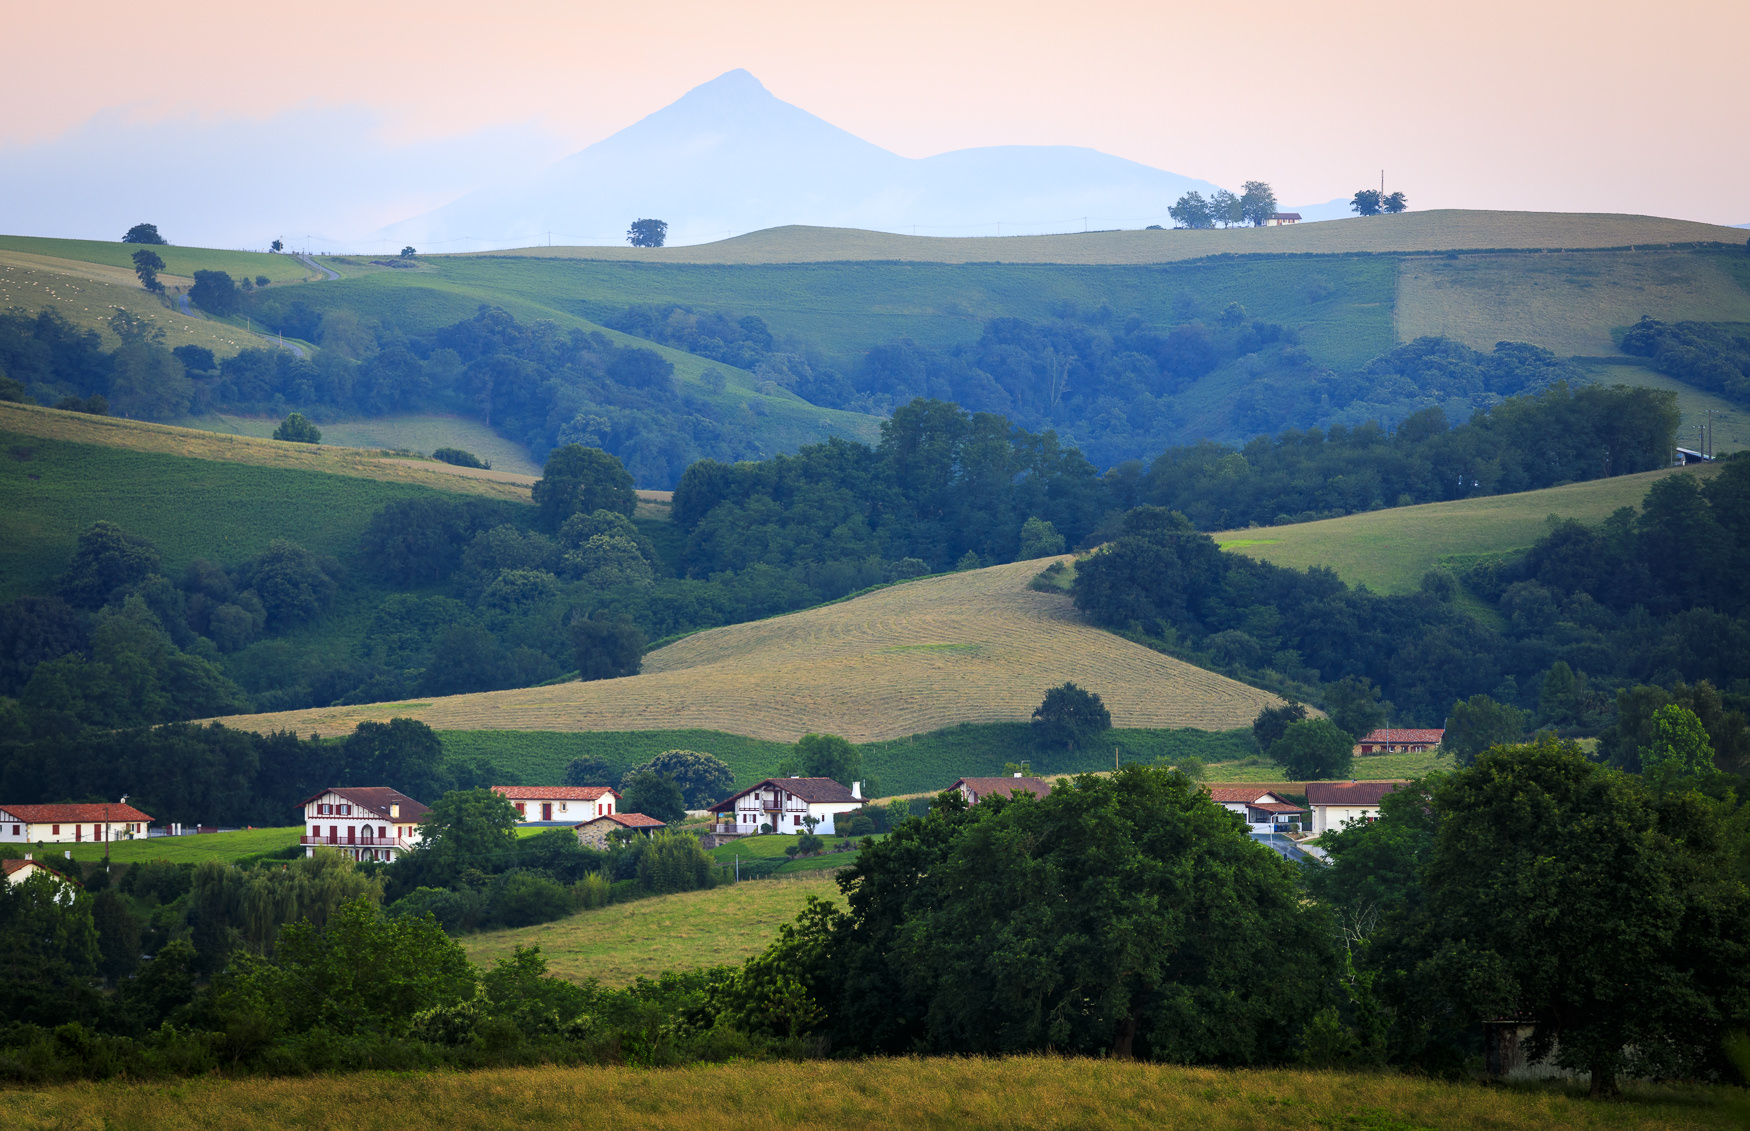 Pays Basque-France-SH-Jul18-HiRes01.jpg